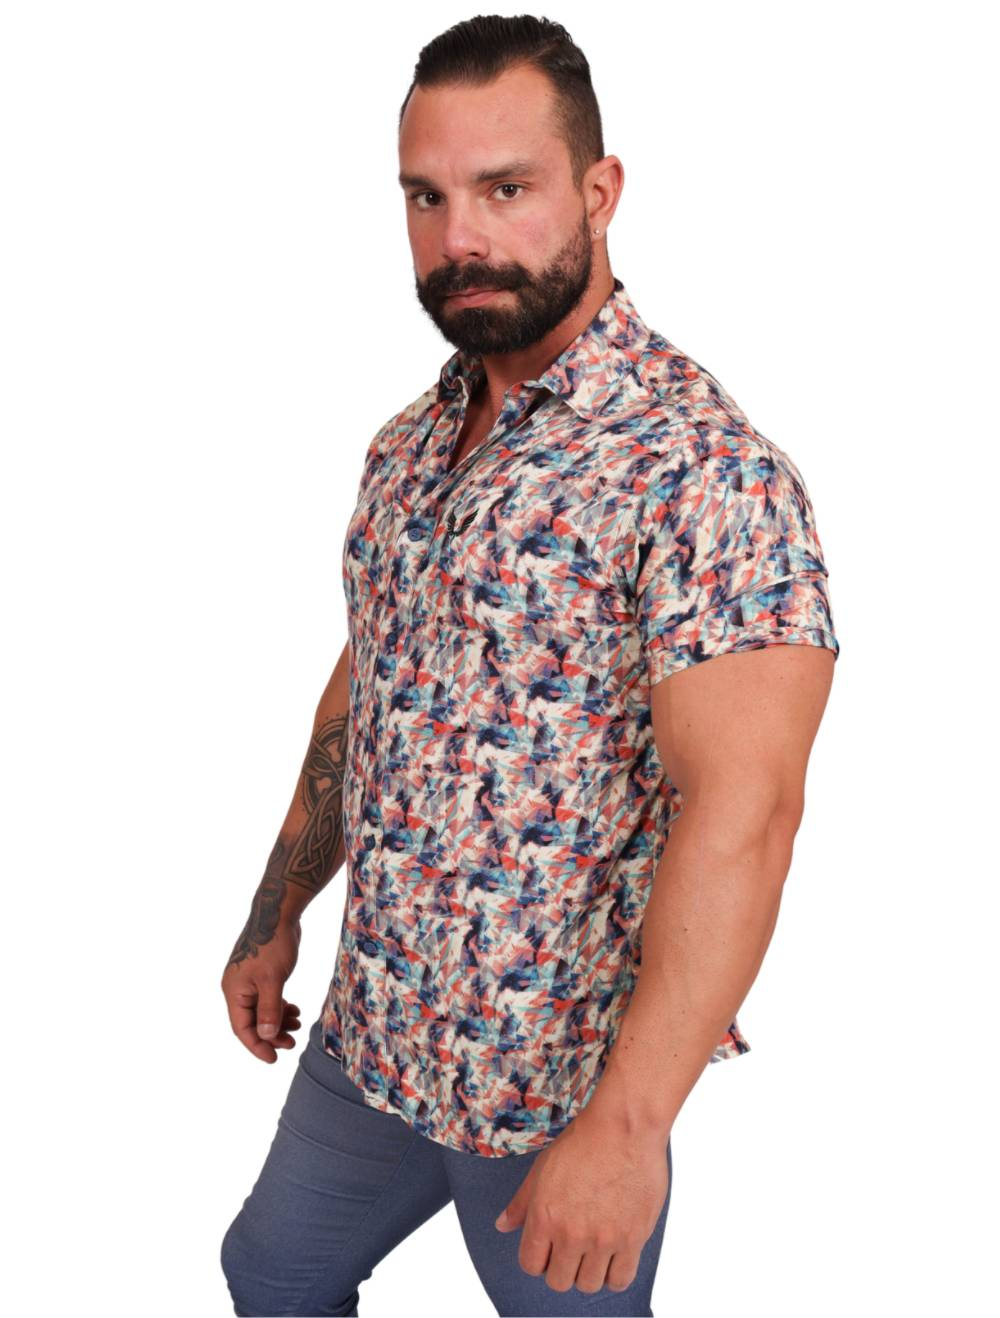 Camisa Masculina Estampada Geométrica Slim